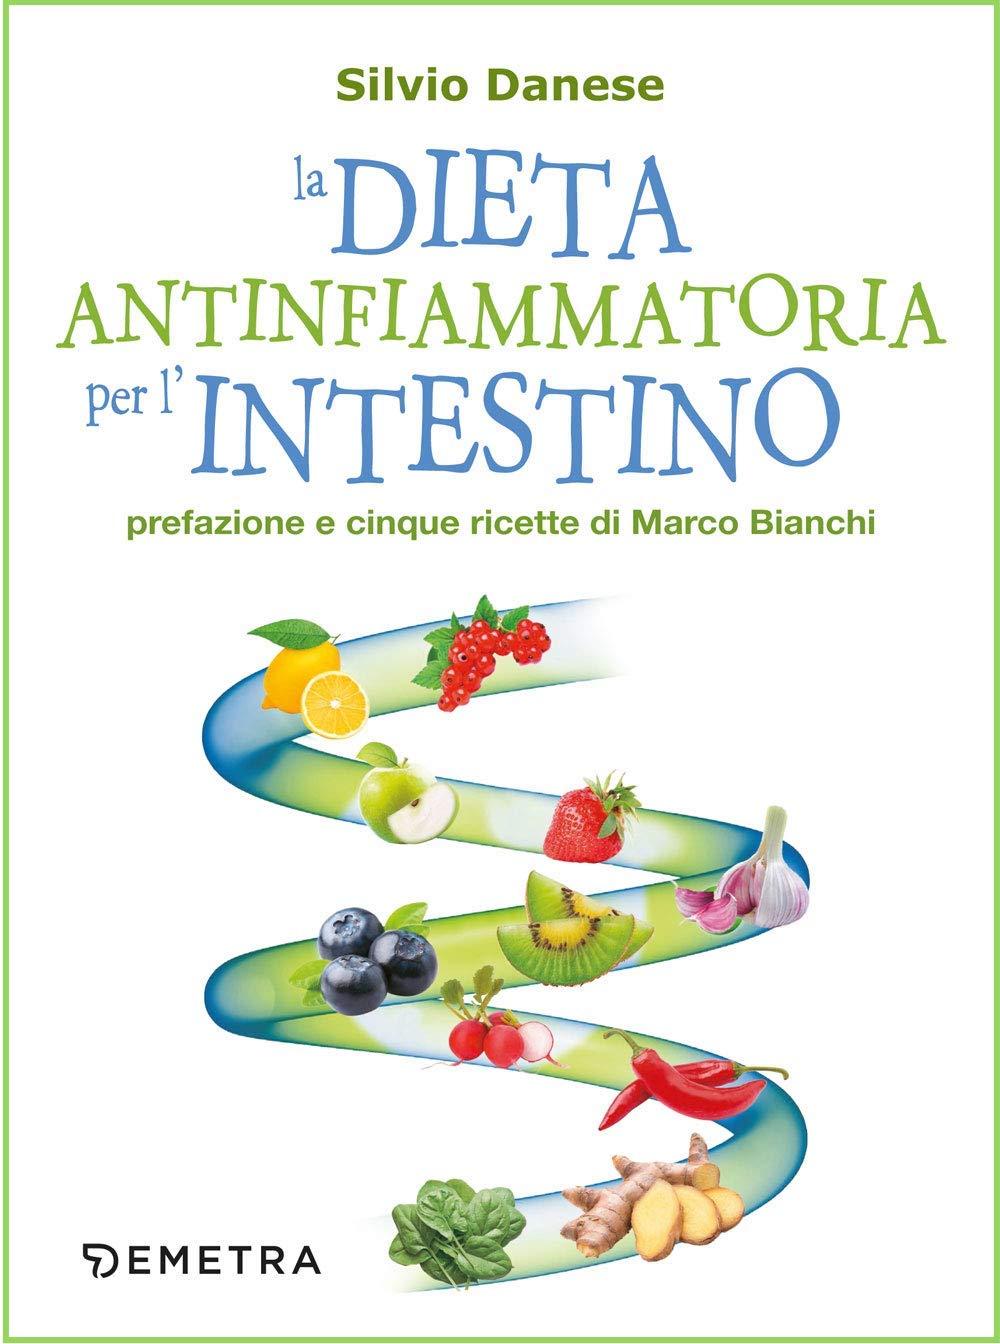 dieta antinfiammatoria intestino copertina danese